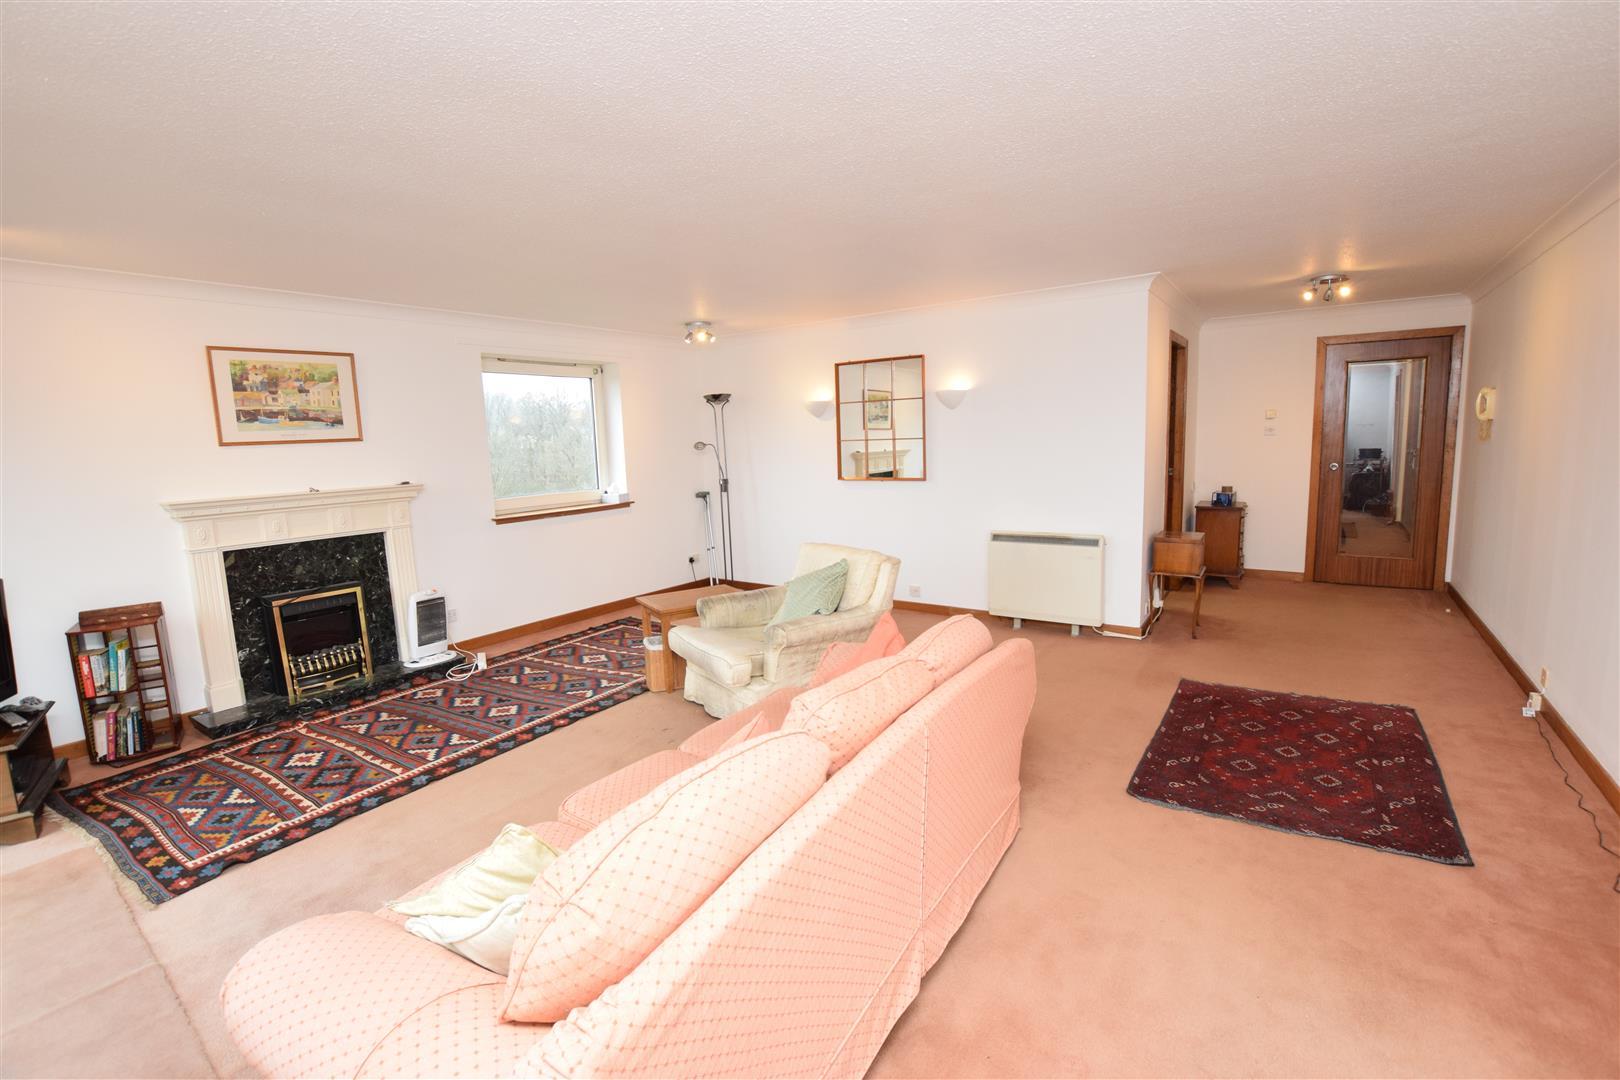 15, Park Manor, Crieff, Perthshire, PH7 4LJ, UK